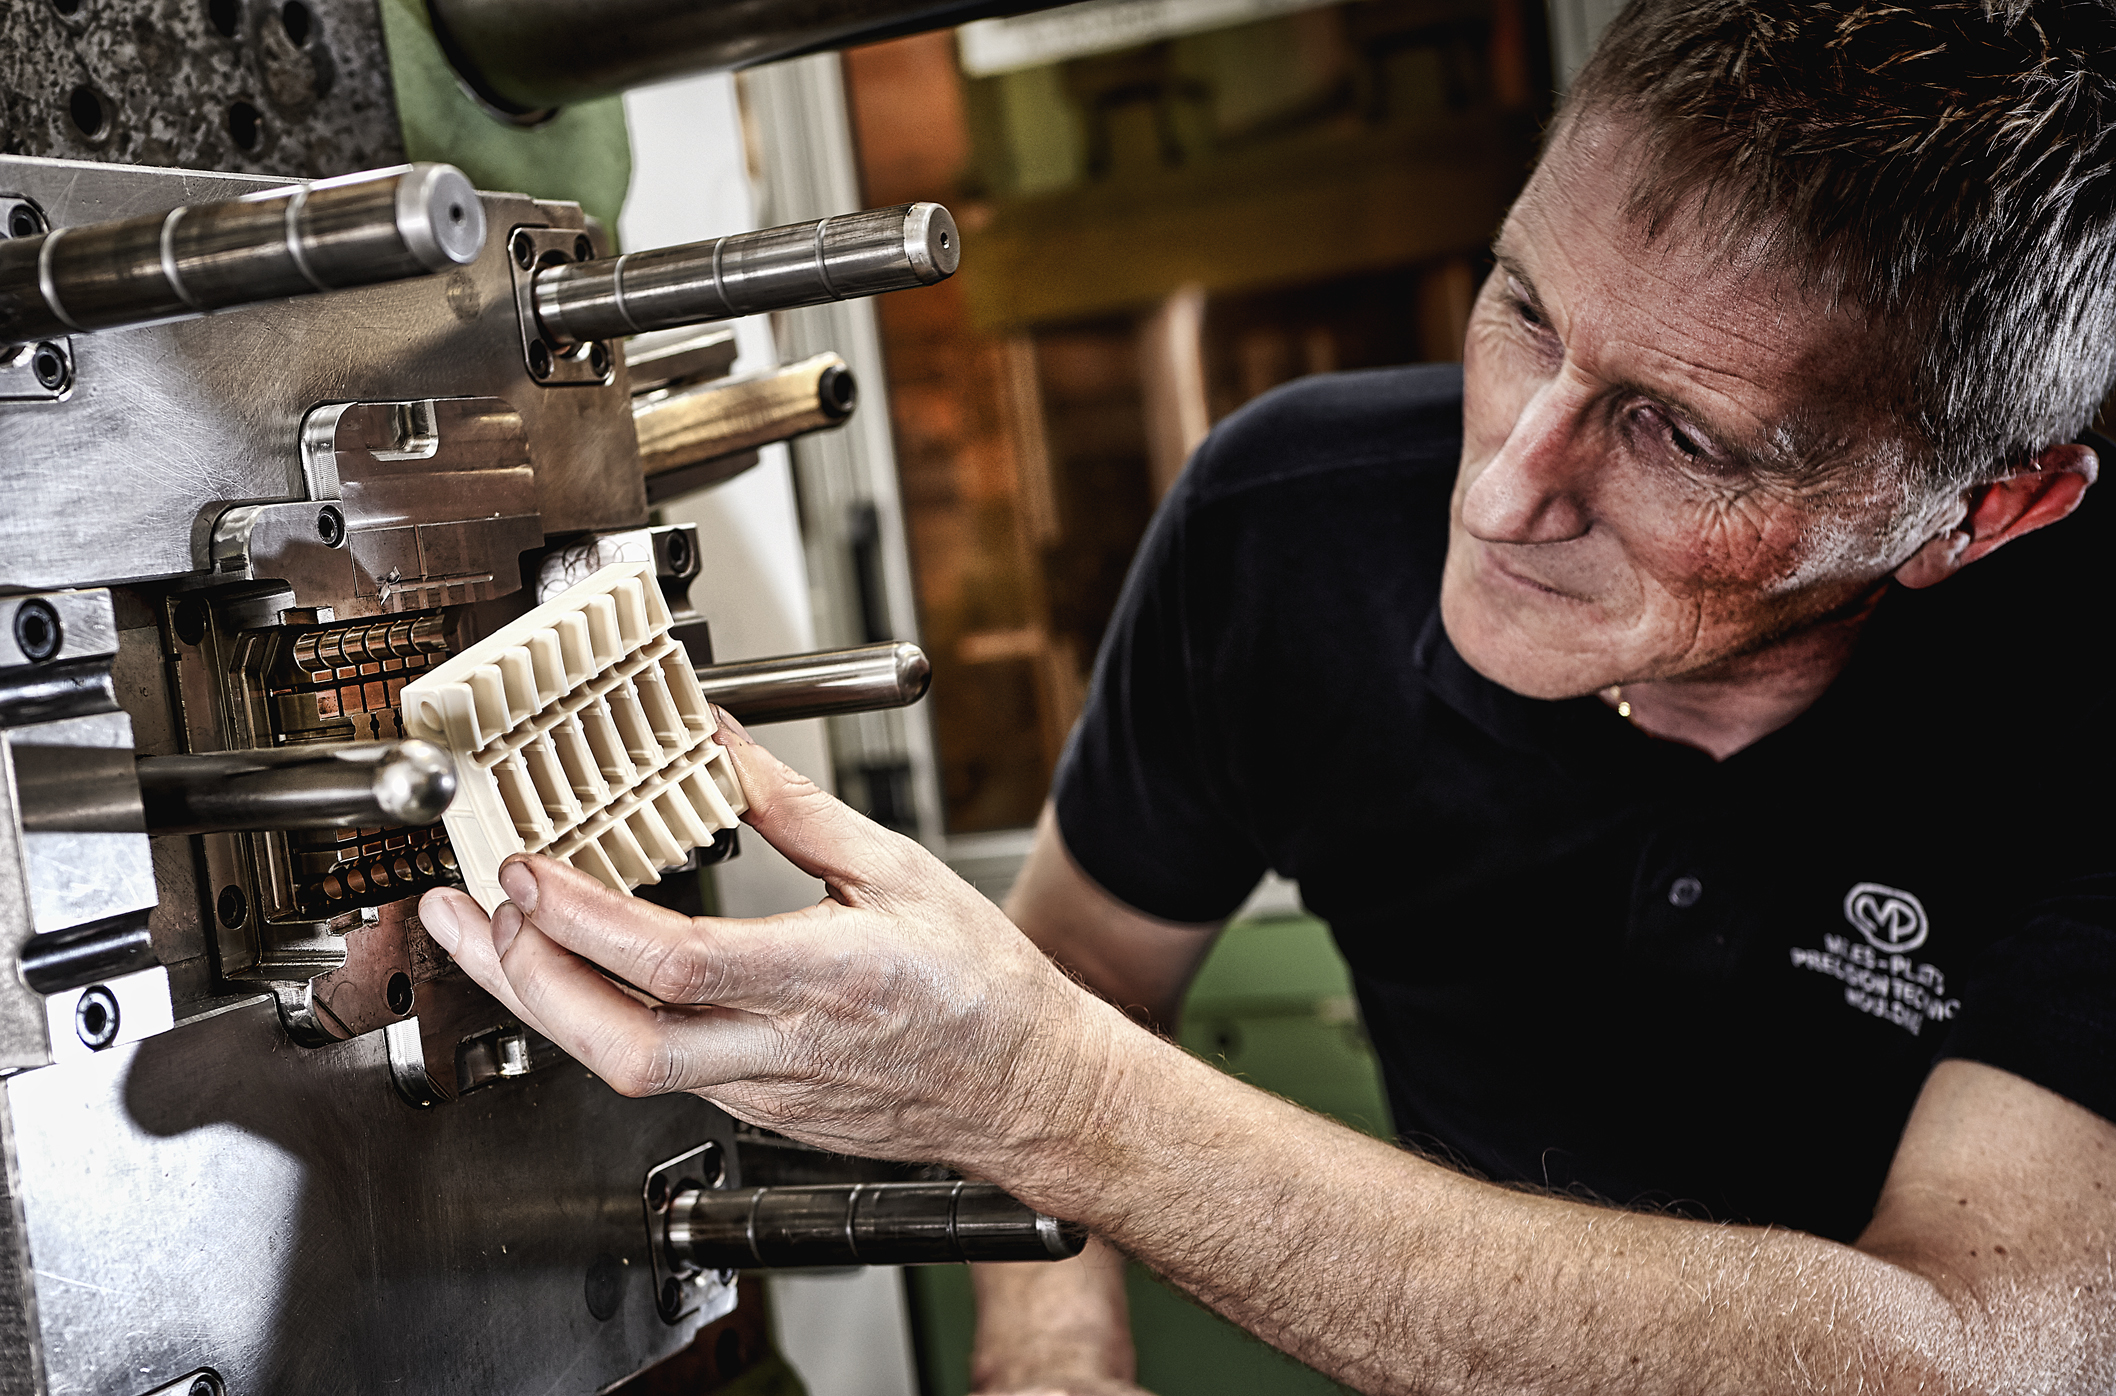 dennisdavis_photography_industrial_manufacturing_engineering.jpg